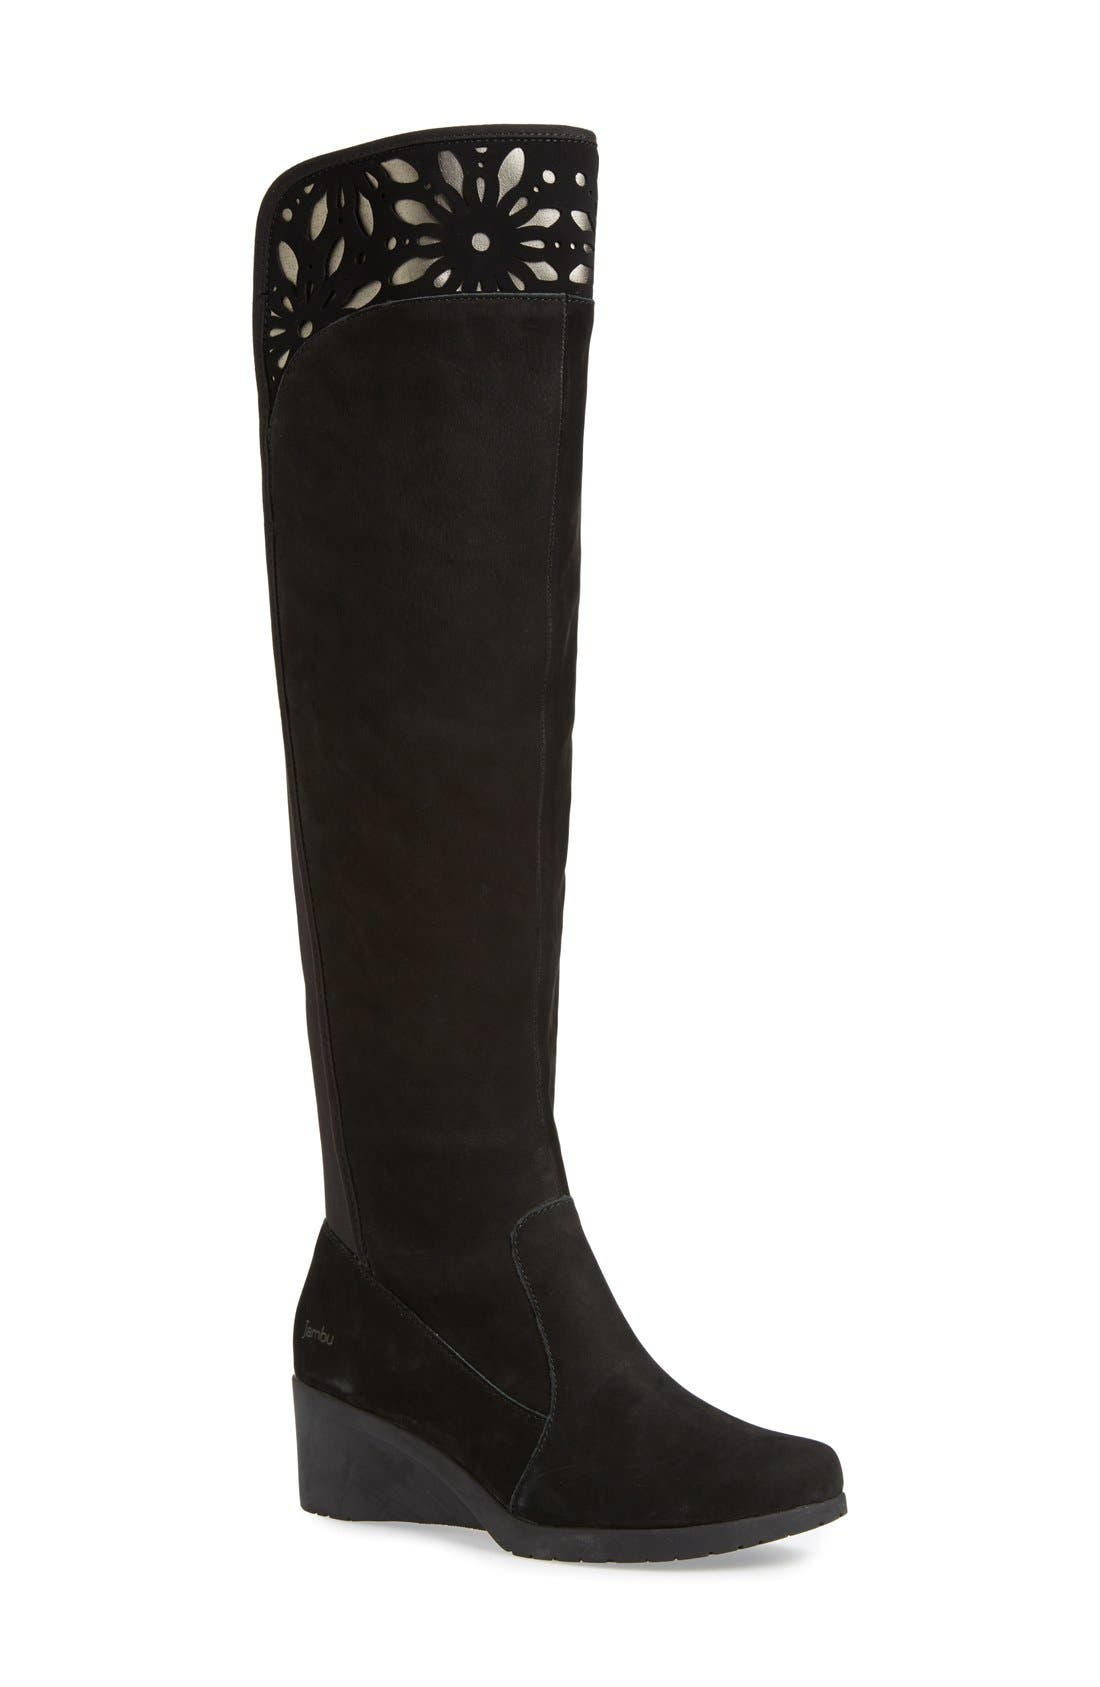 Main Image - Jambu'Natalia' CutoutDetail Water ResistantOver the Knee Boot (Women)